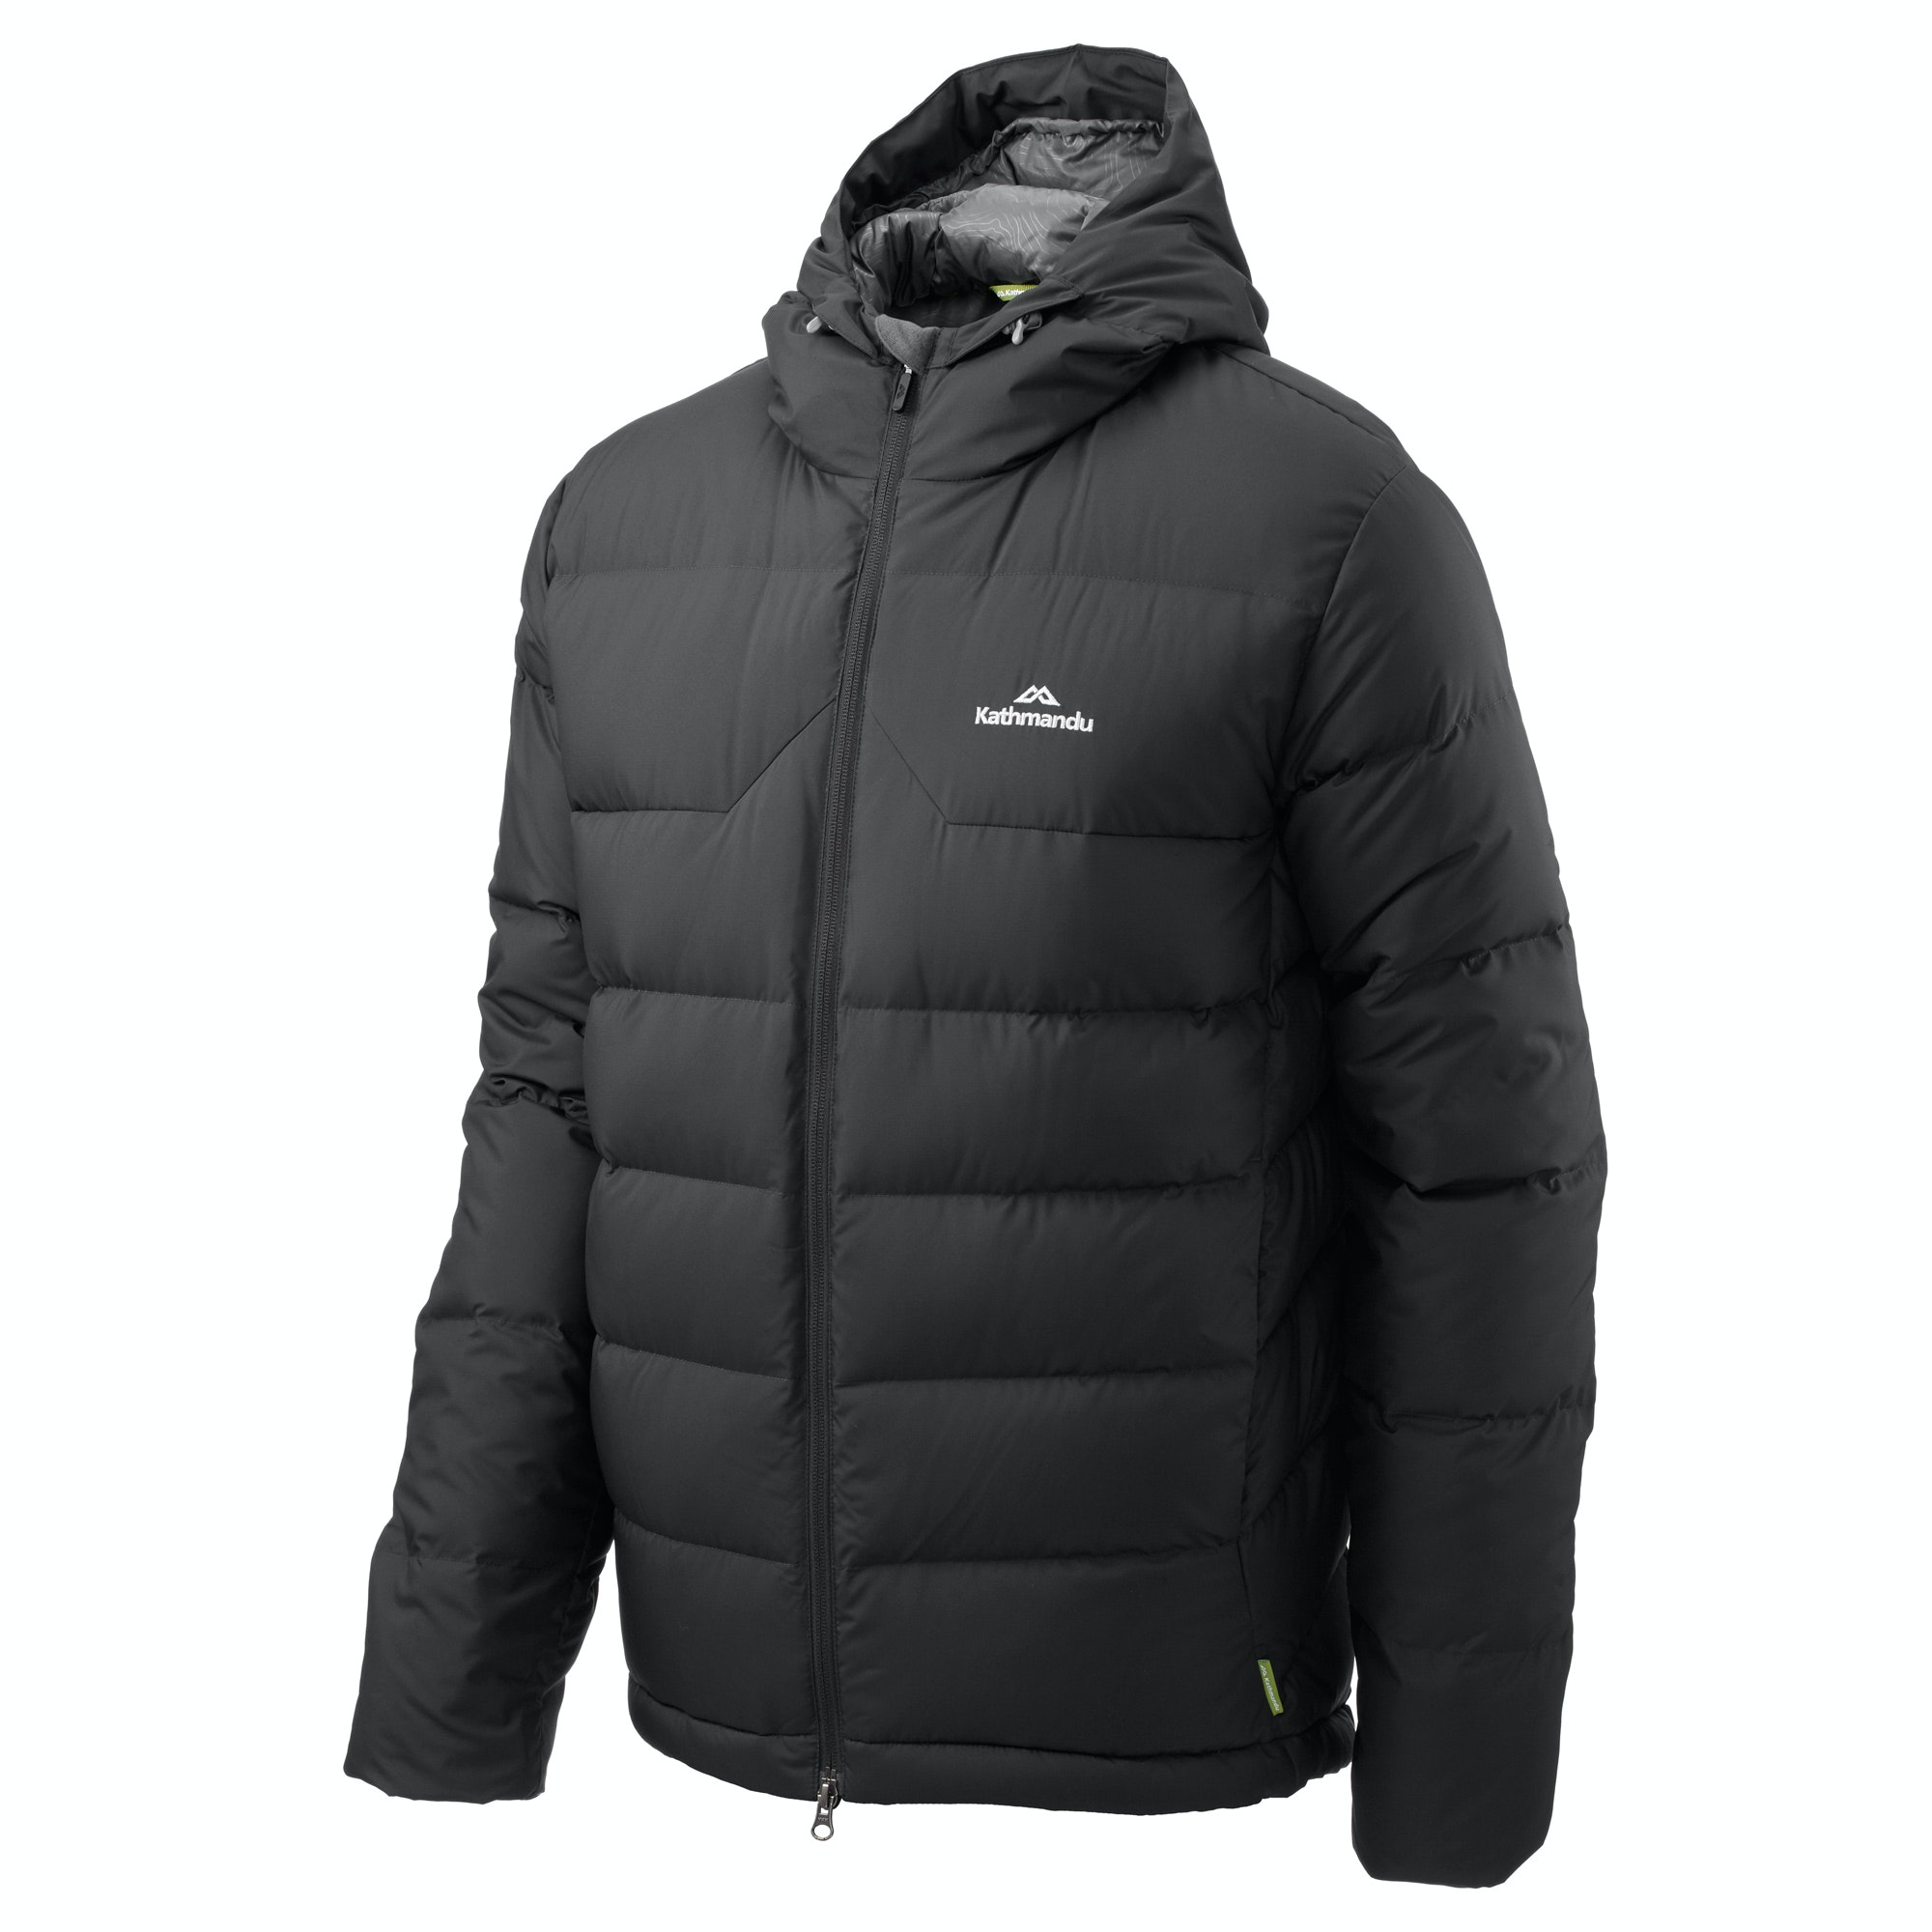 NEW-Kathmandu-Epiq-Men-039-s-Hooded-Warm-Winter-Duck-Down-Puffer-Jacket-v2 thumbnail 9